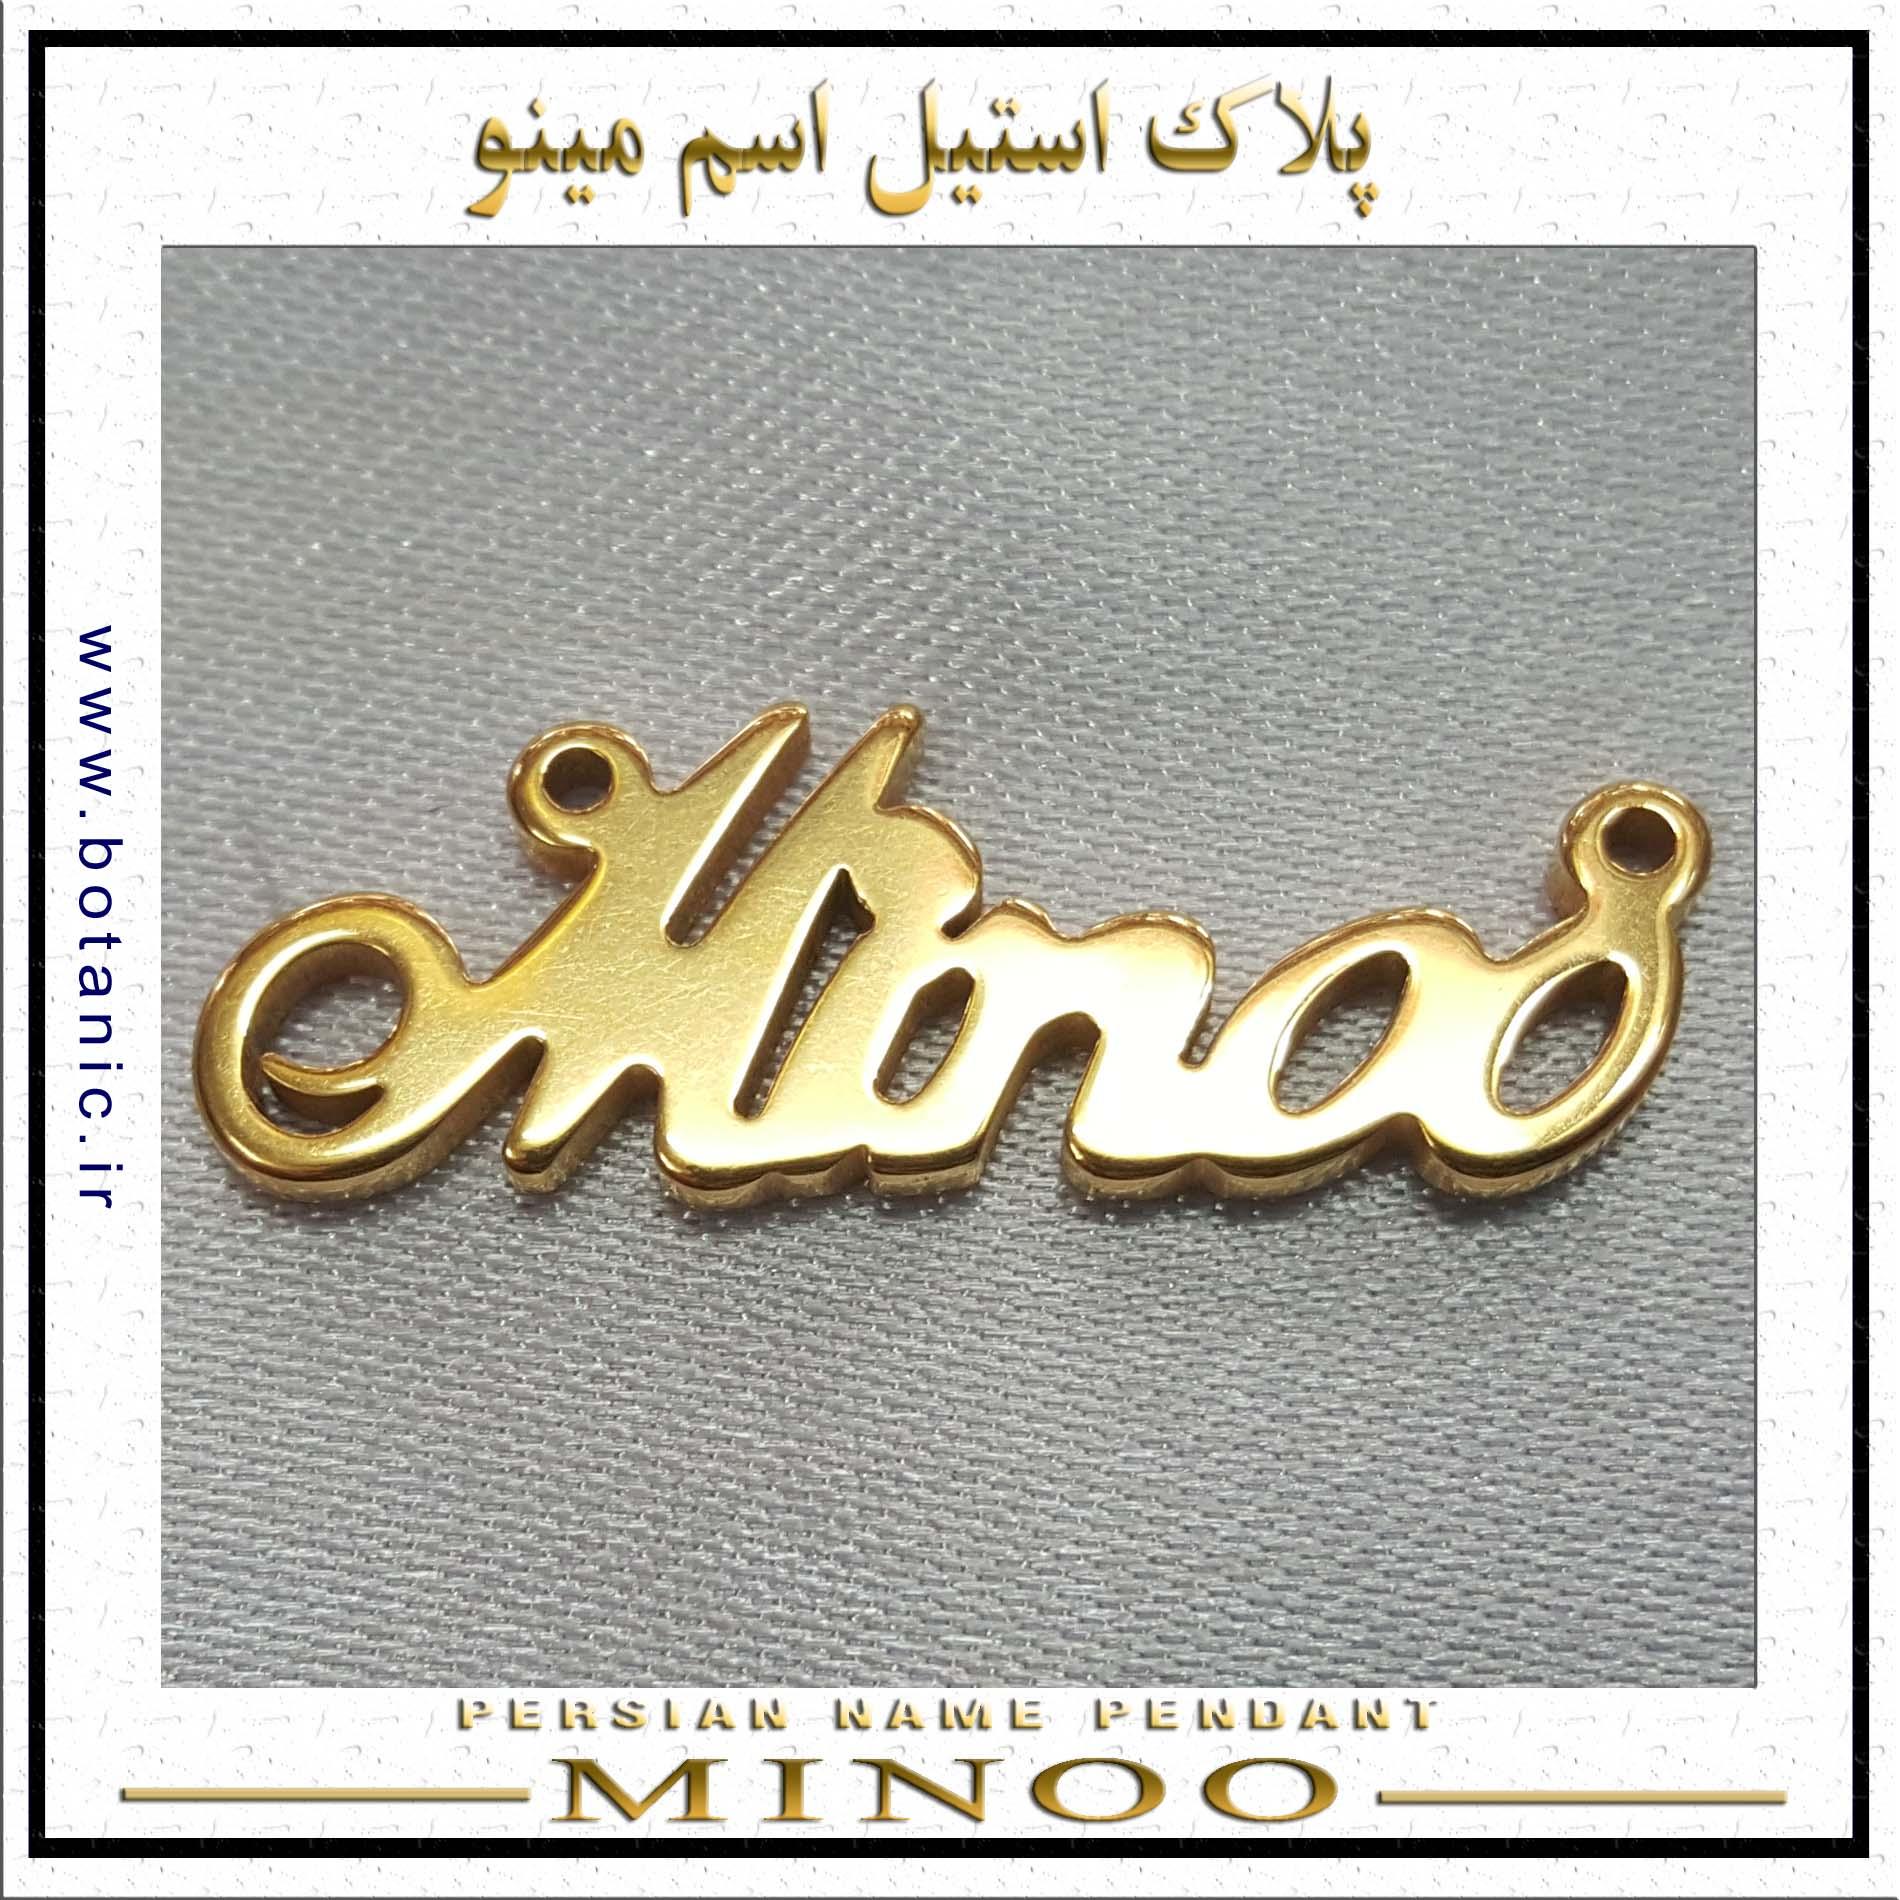 Iranian Name Pendant Minoo